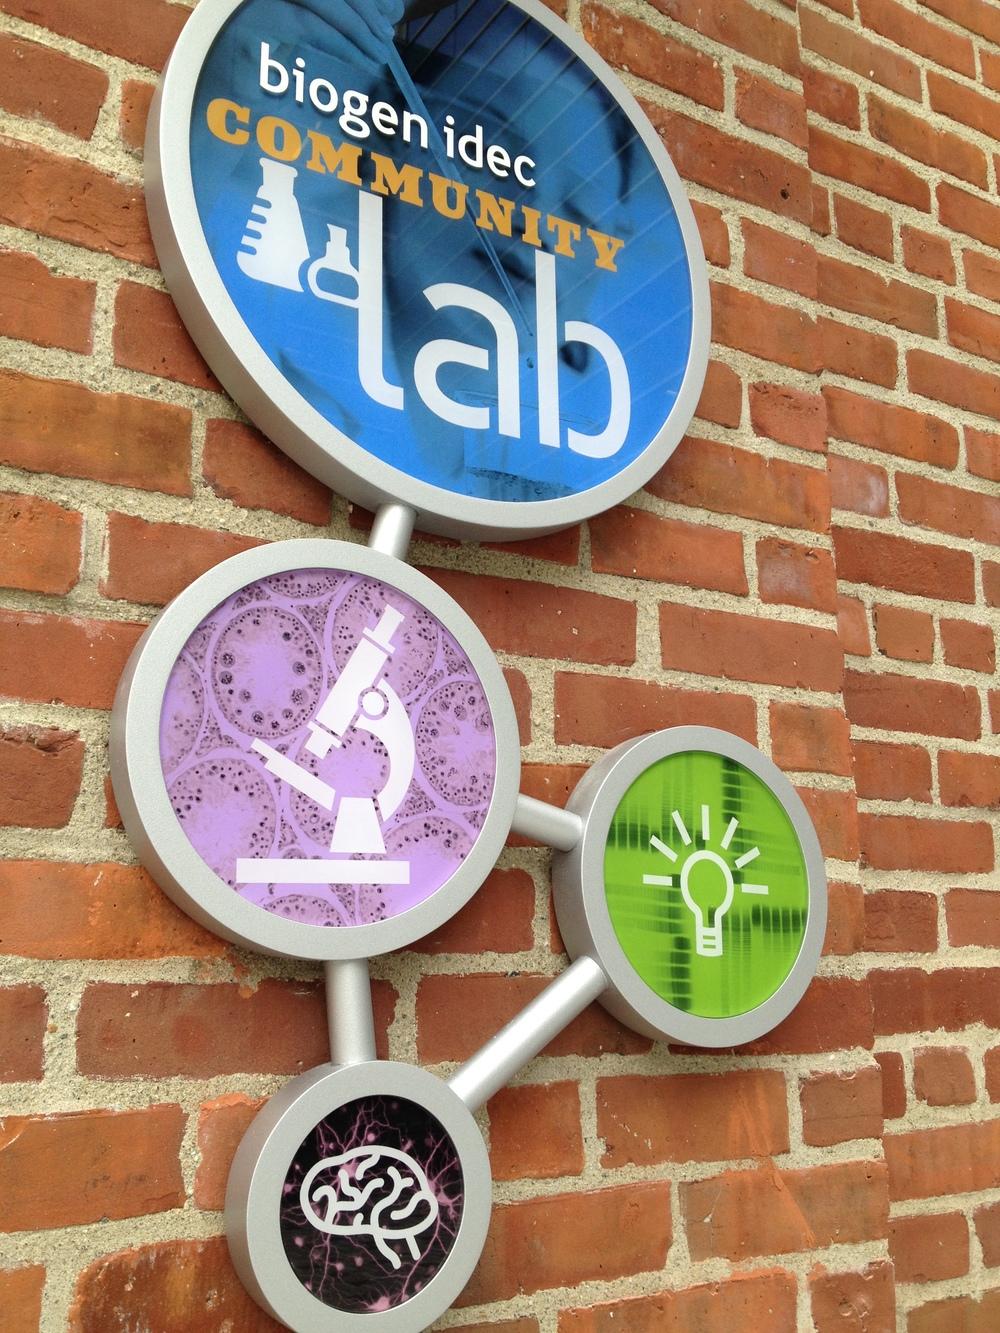 biogen community lab